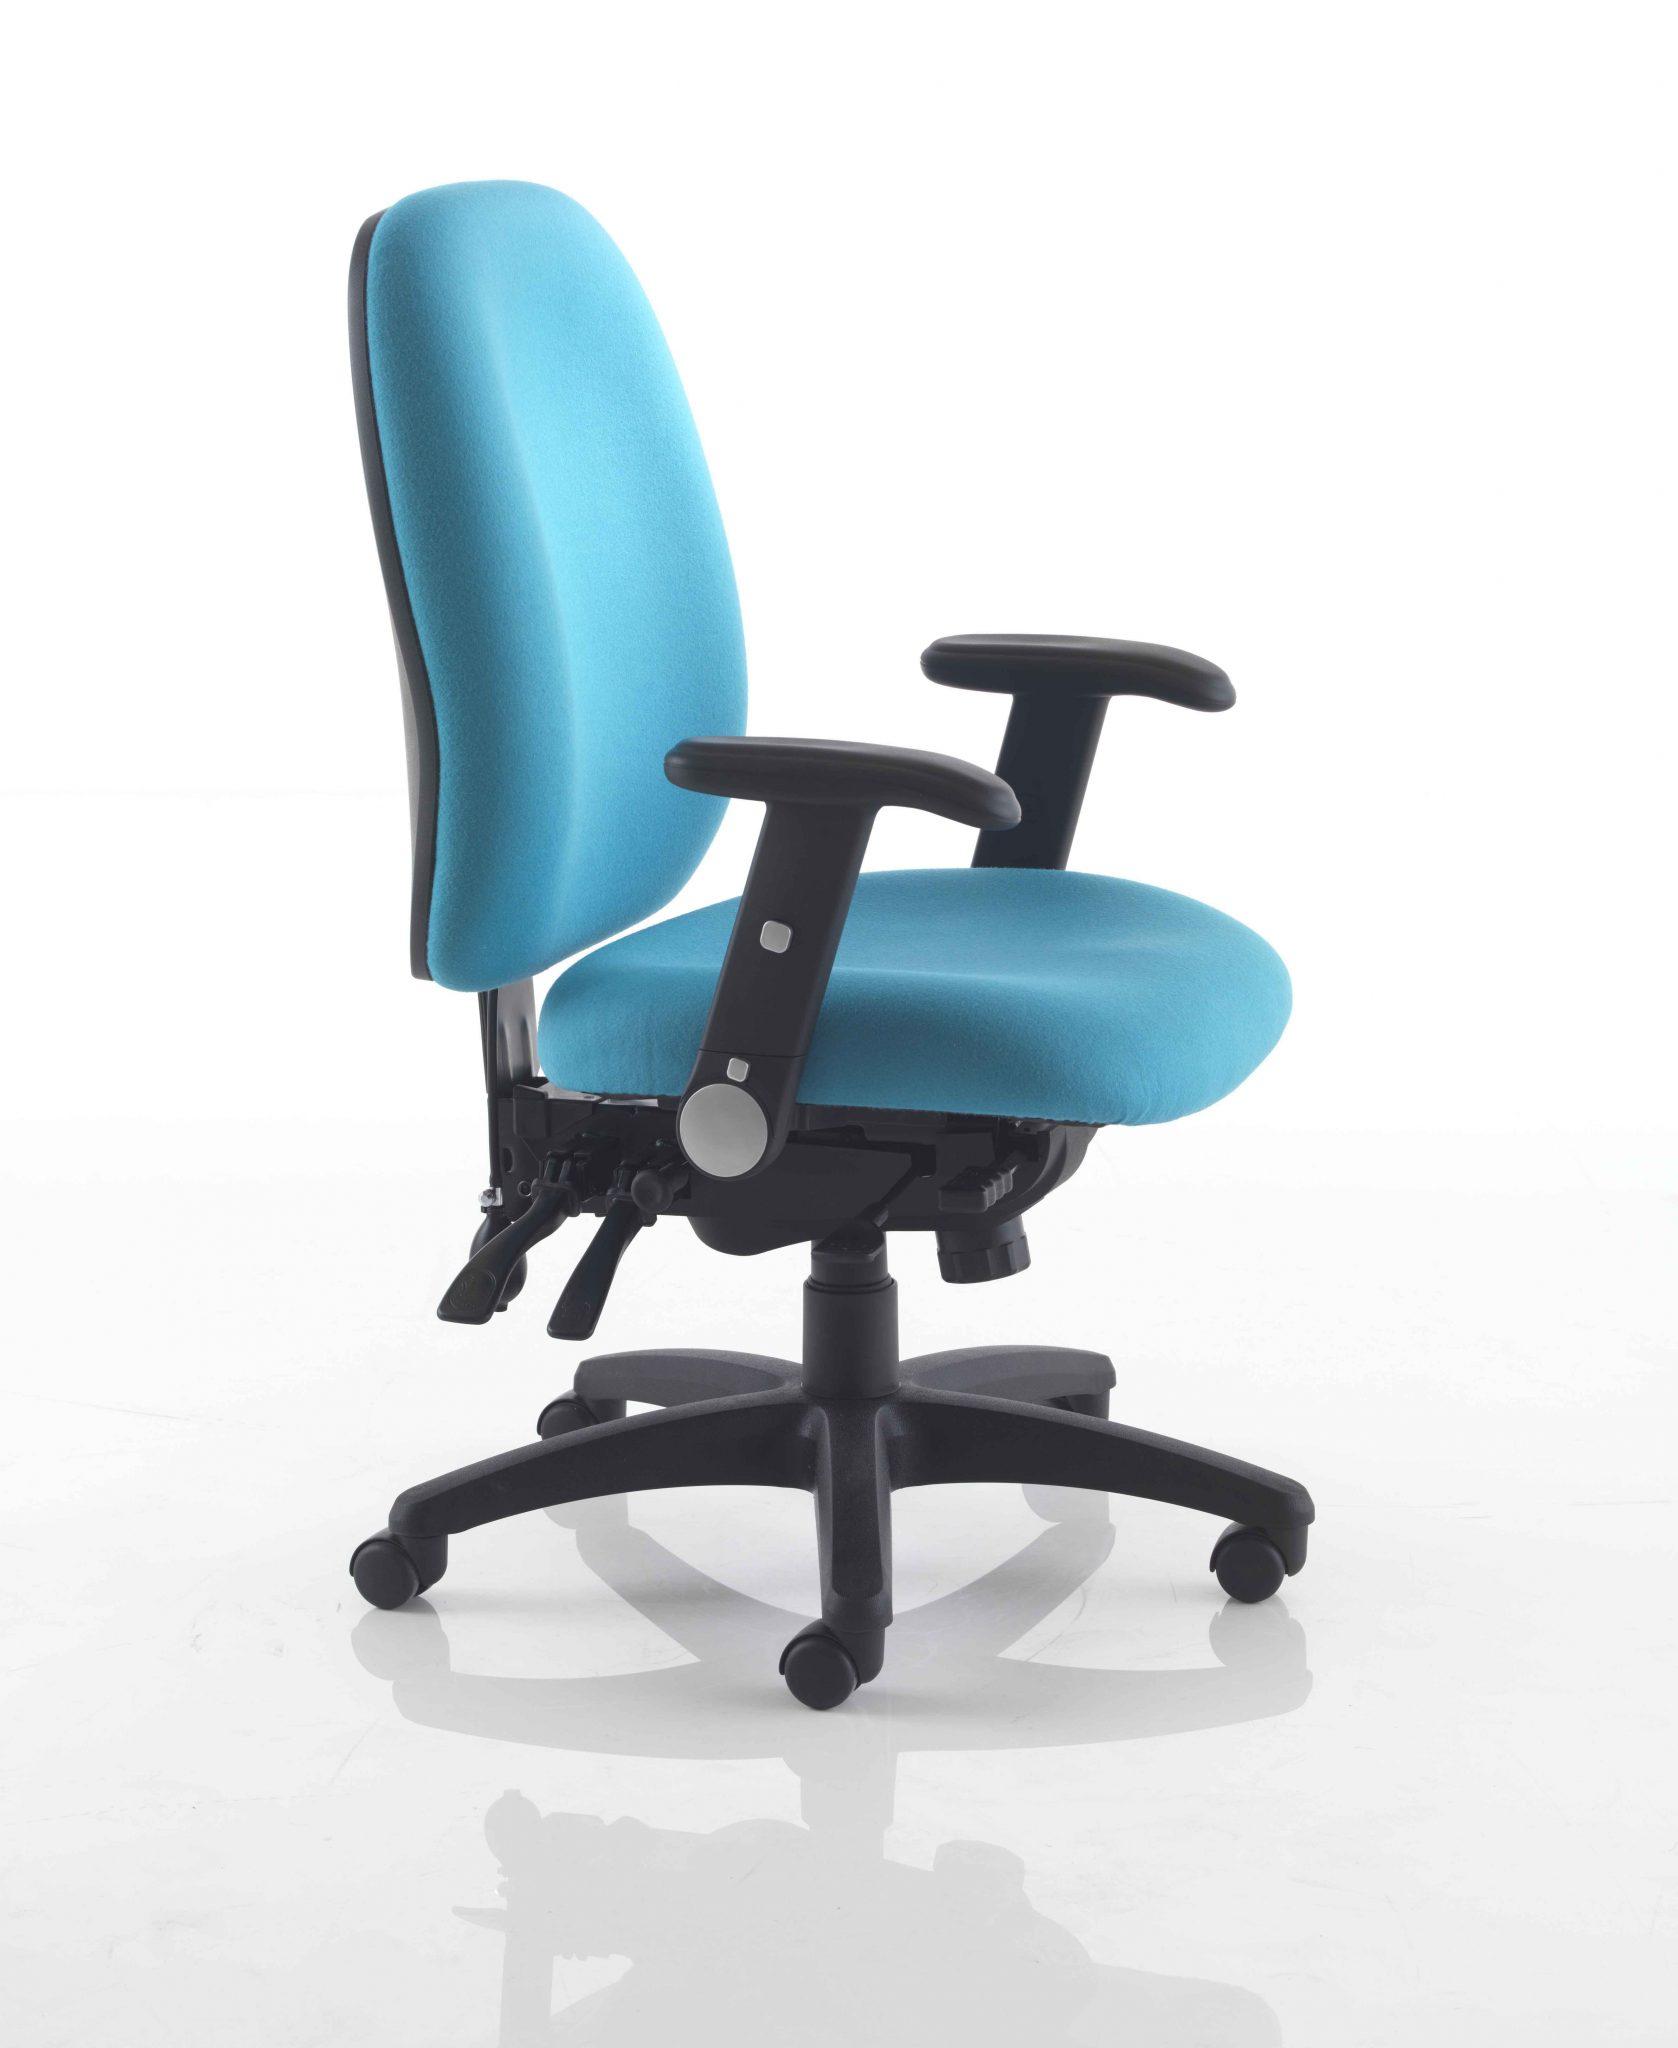 posture alignment chair bedroom corner ideas stellar claremont office furniture